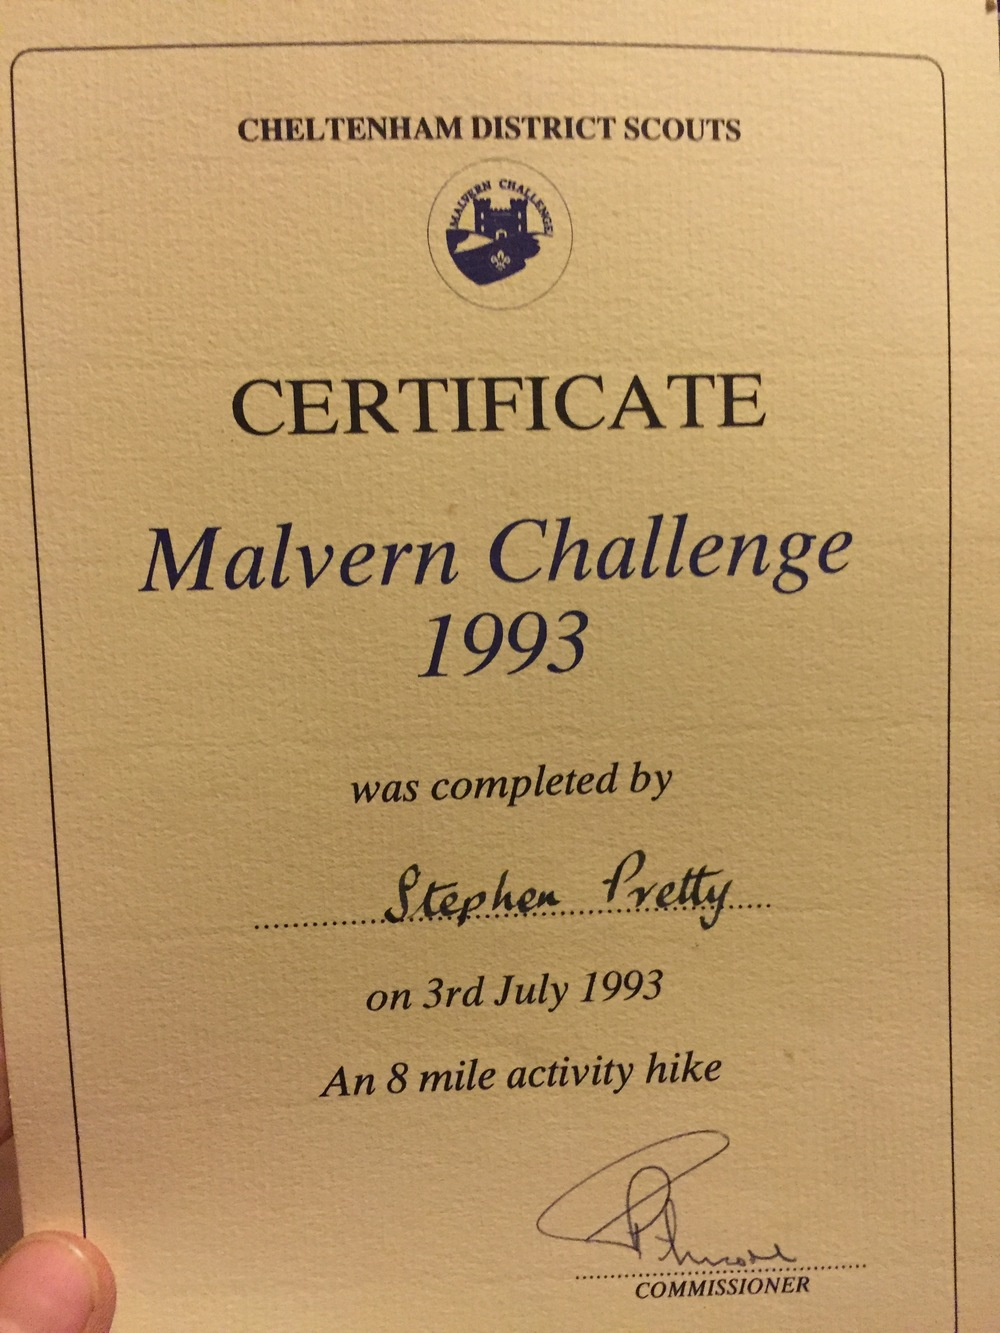 certificates_23270790523_o.jpg